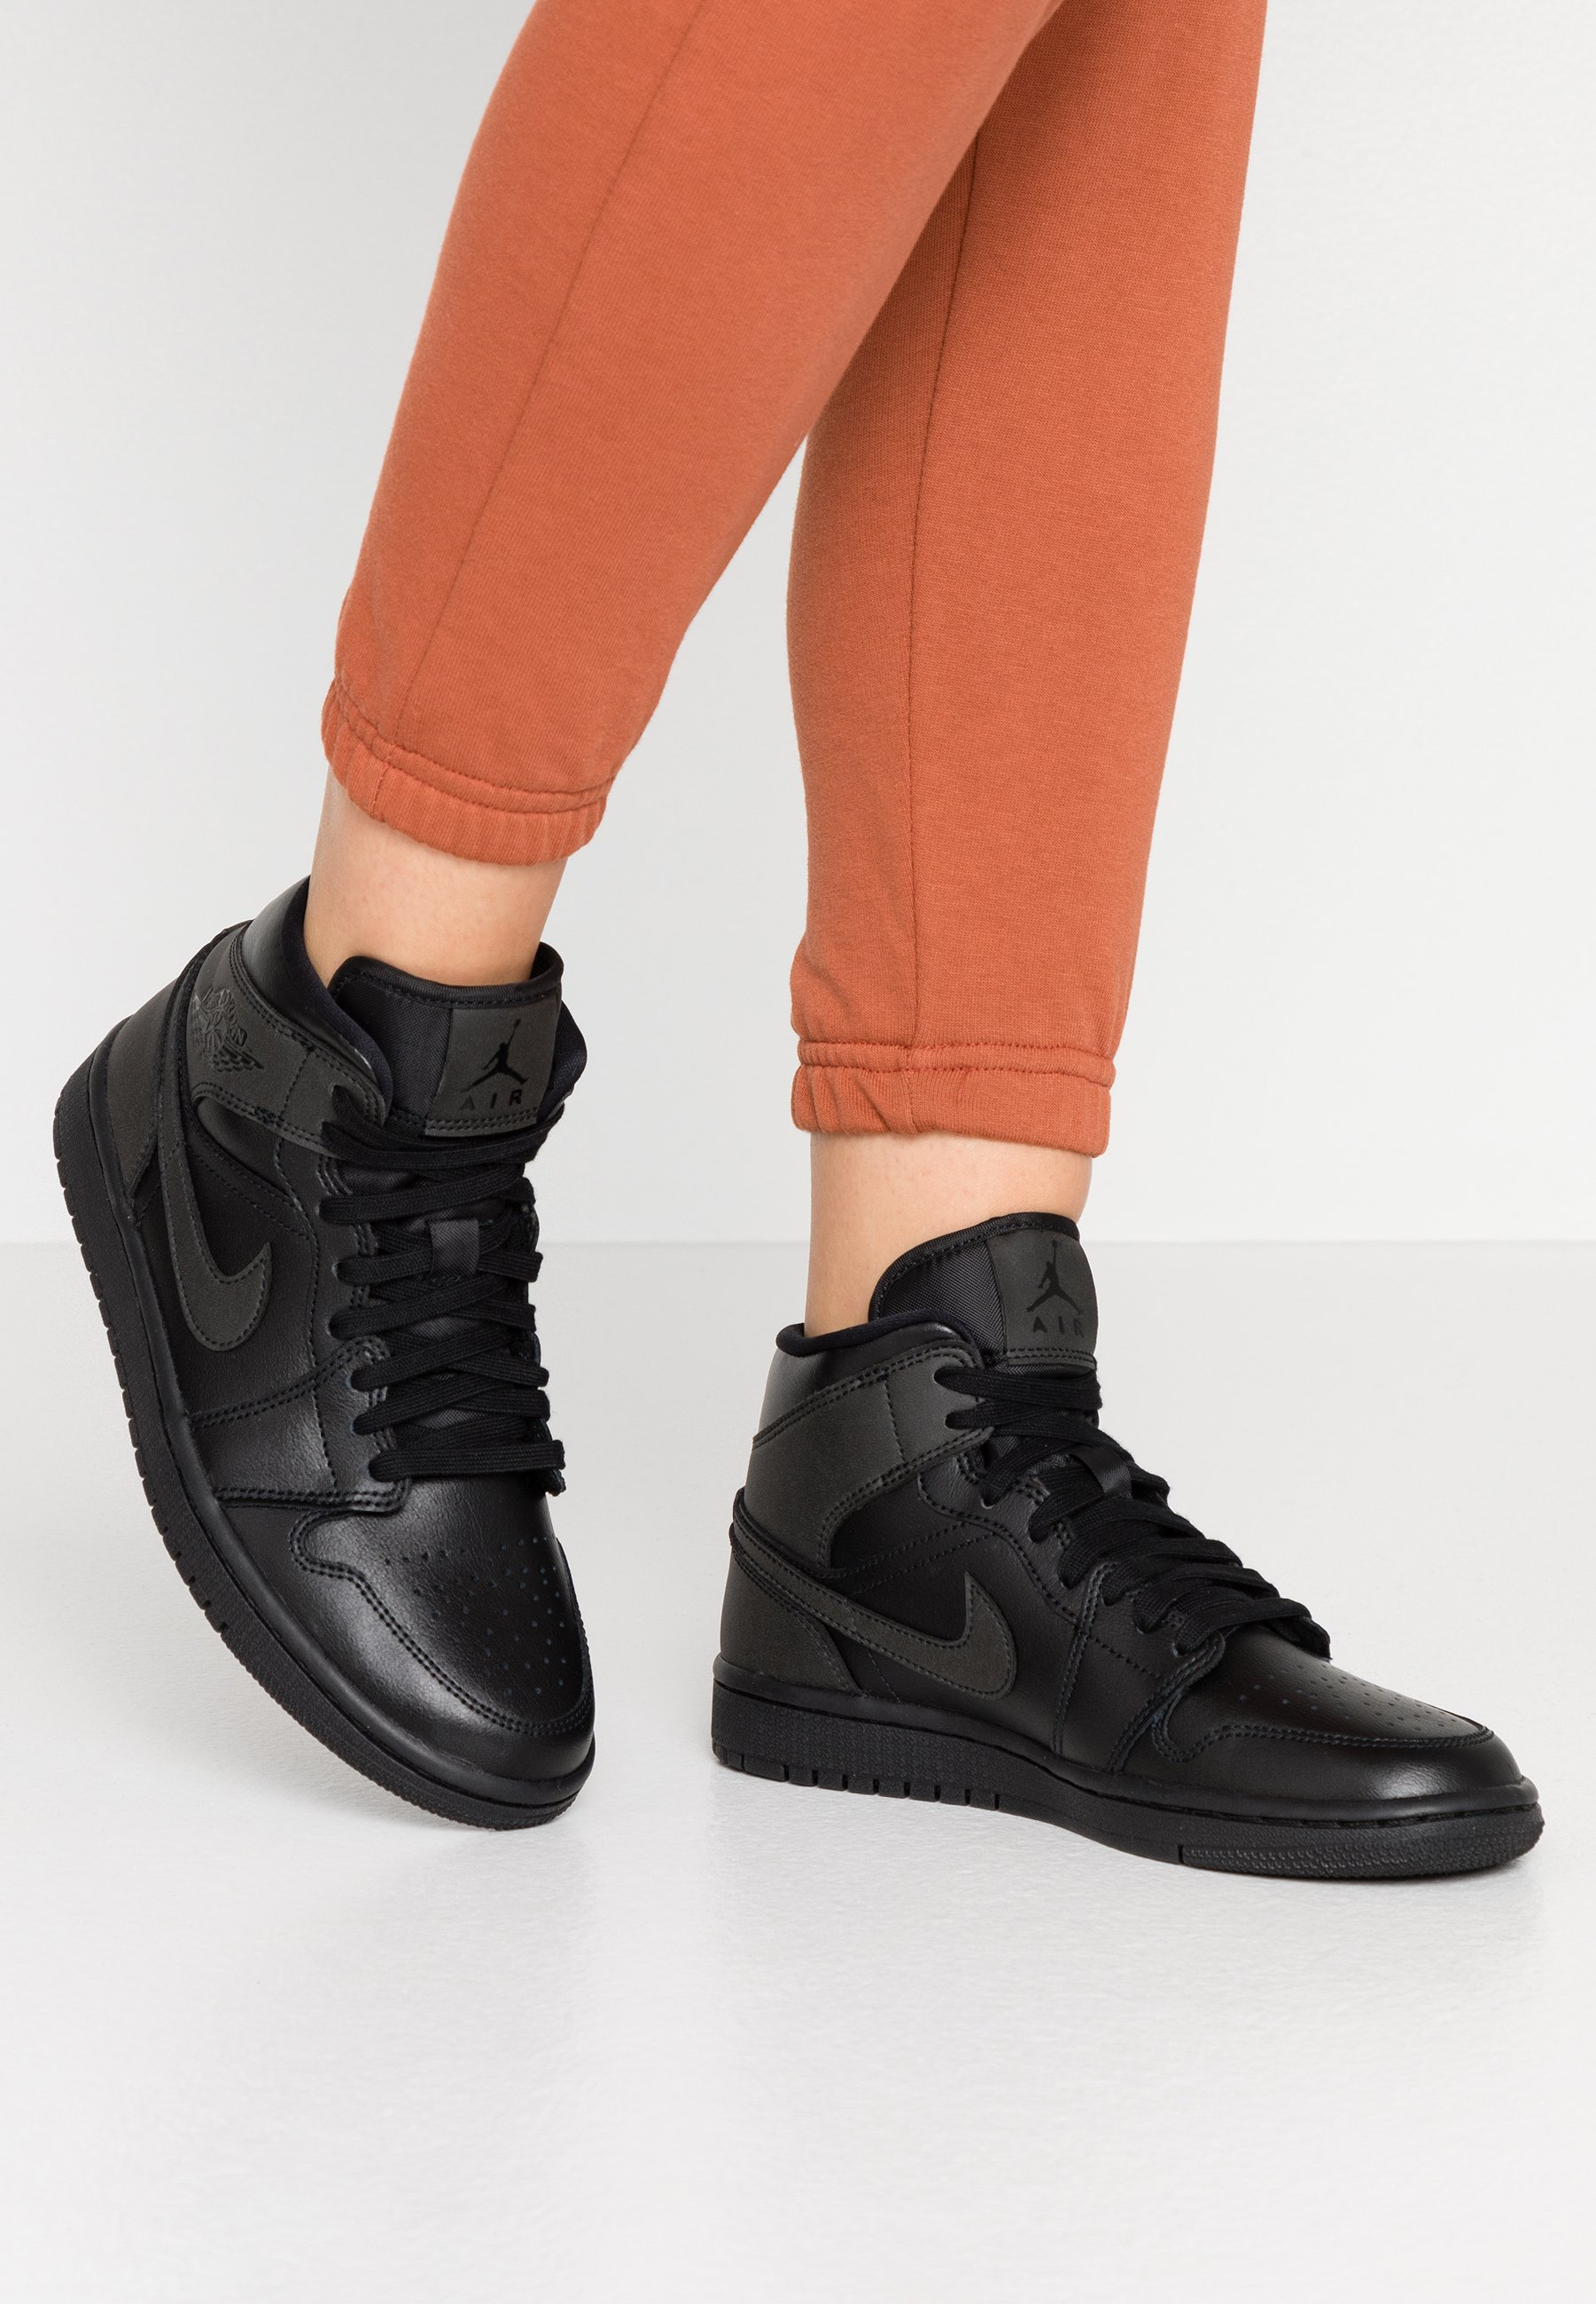 Jordan WOMENS AIR 1 MID - Baskets montantes - black/noir - ZALANDO.FR